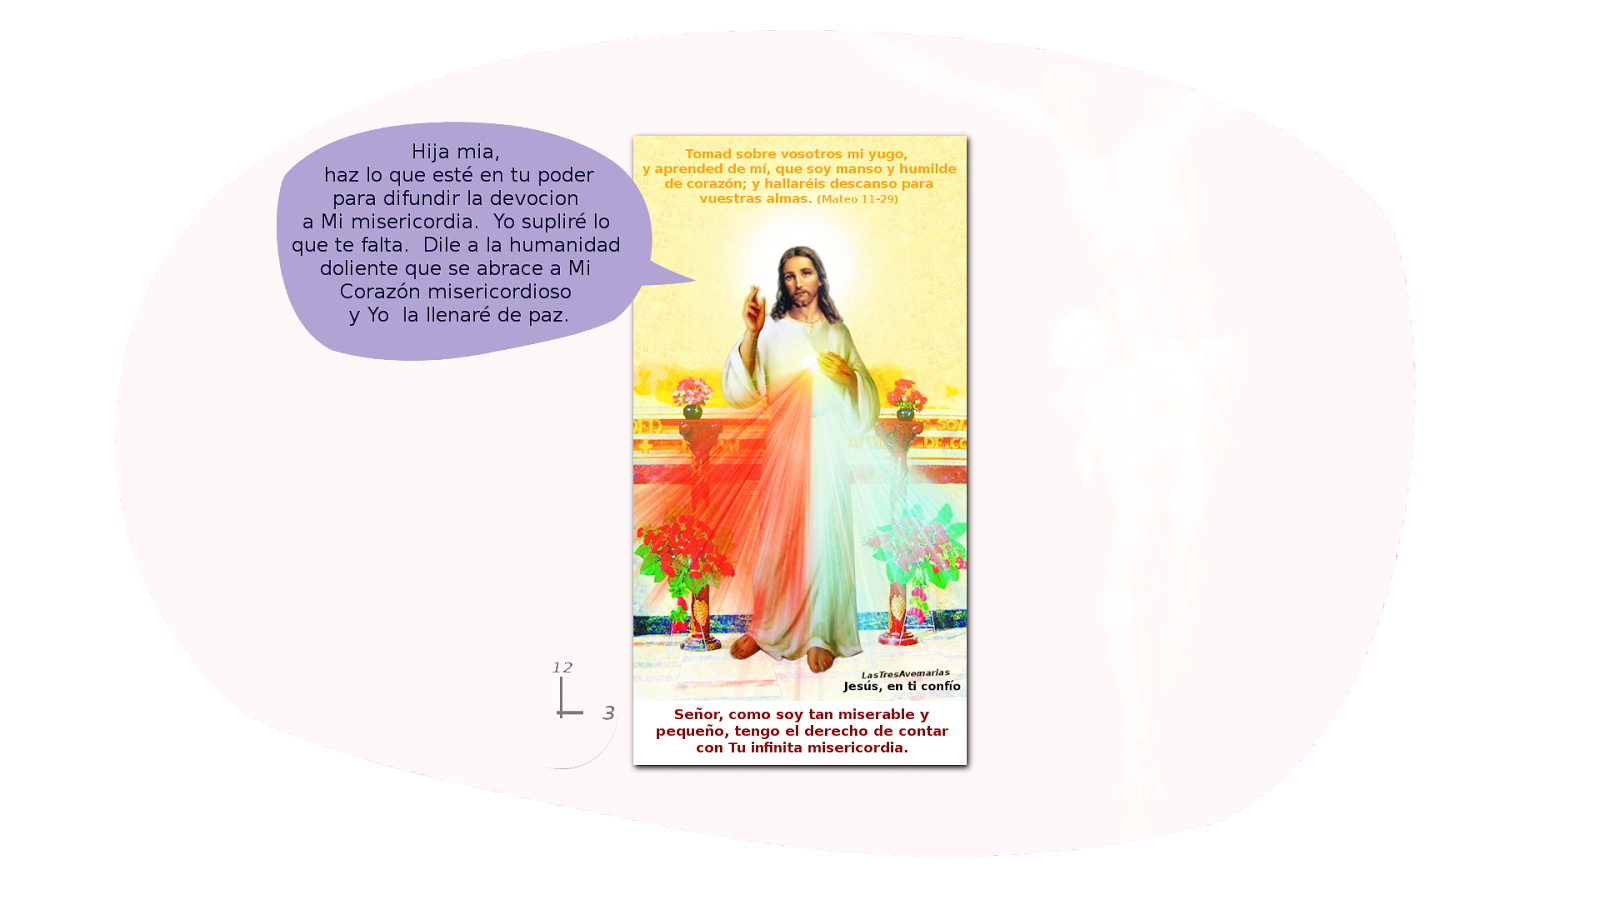 mensaje de la divina misericordia a sus devotos